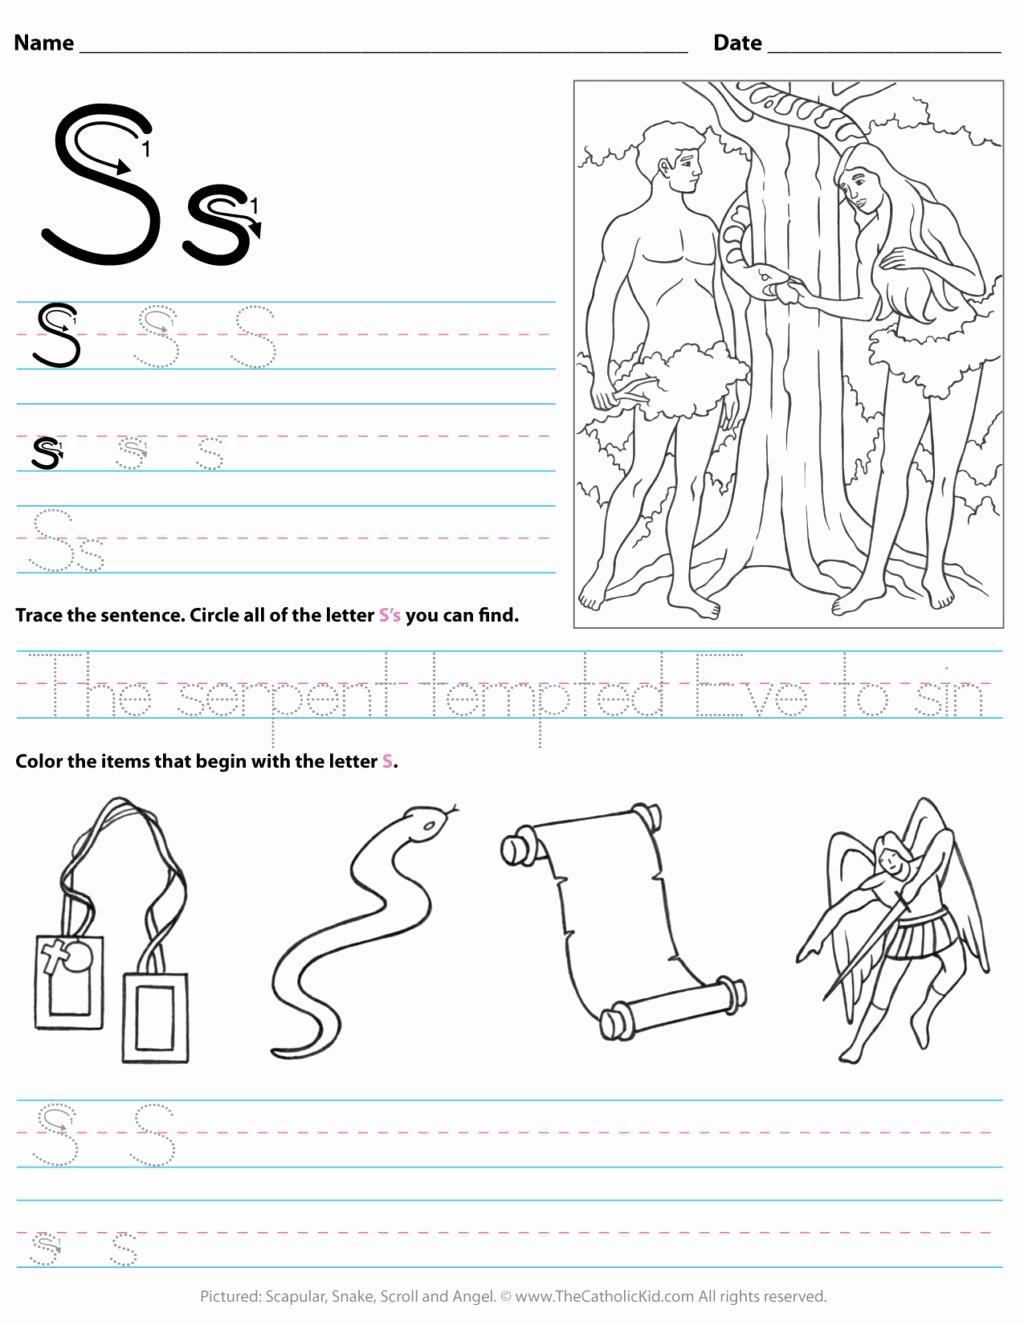 catholic alphabet letter s worksheet preschool kindergarten cnt mls tremendous worksheets pdf template 1024x1325